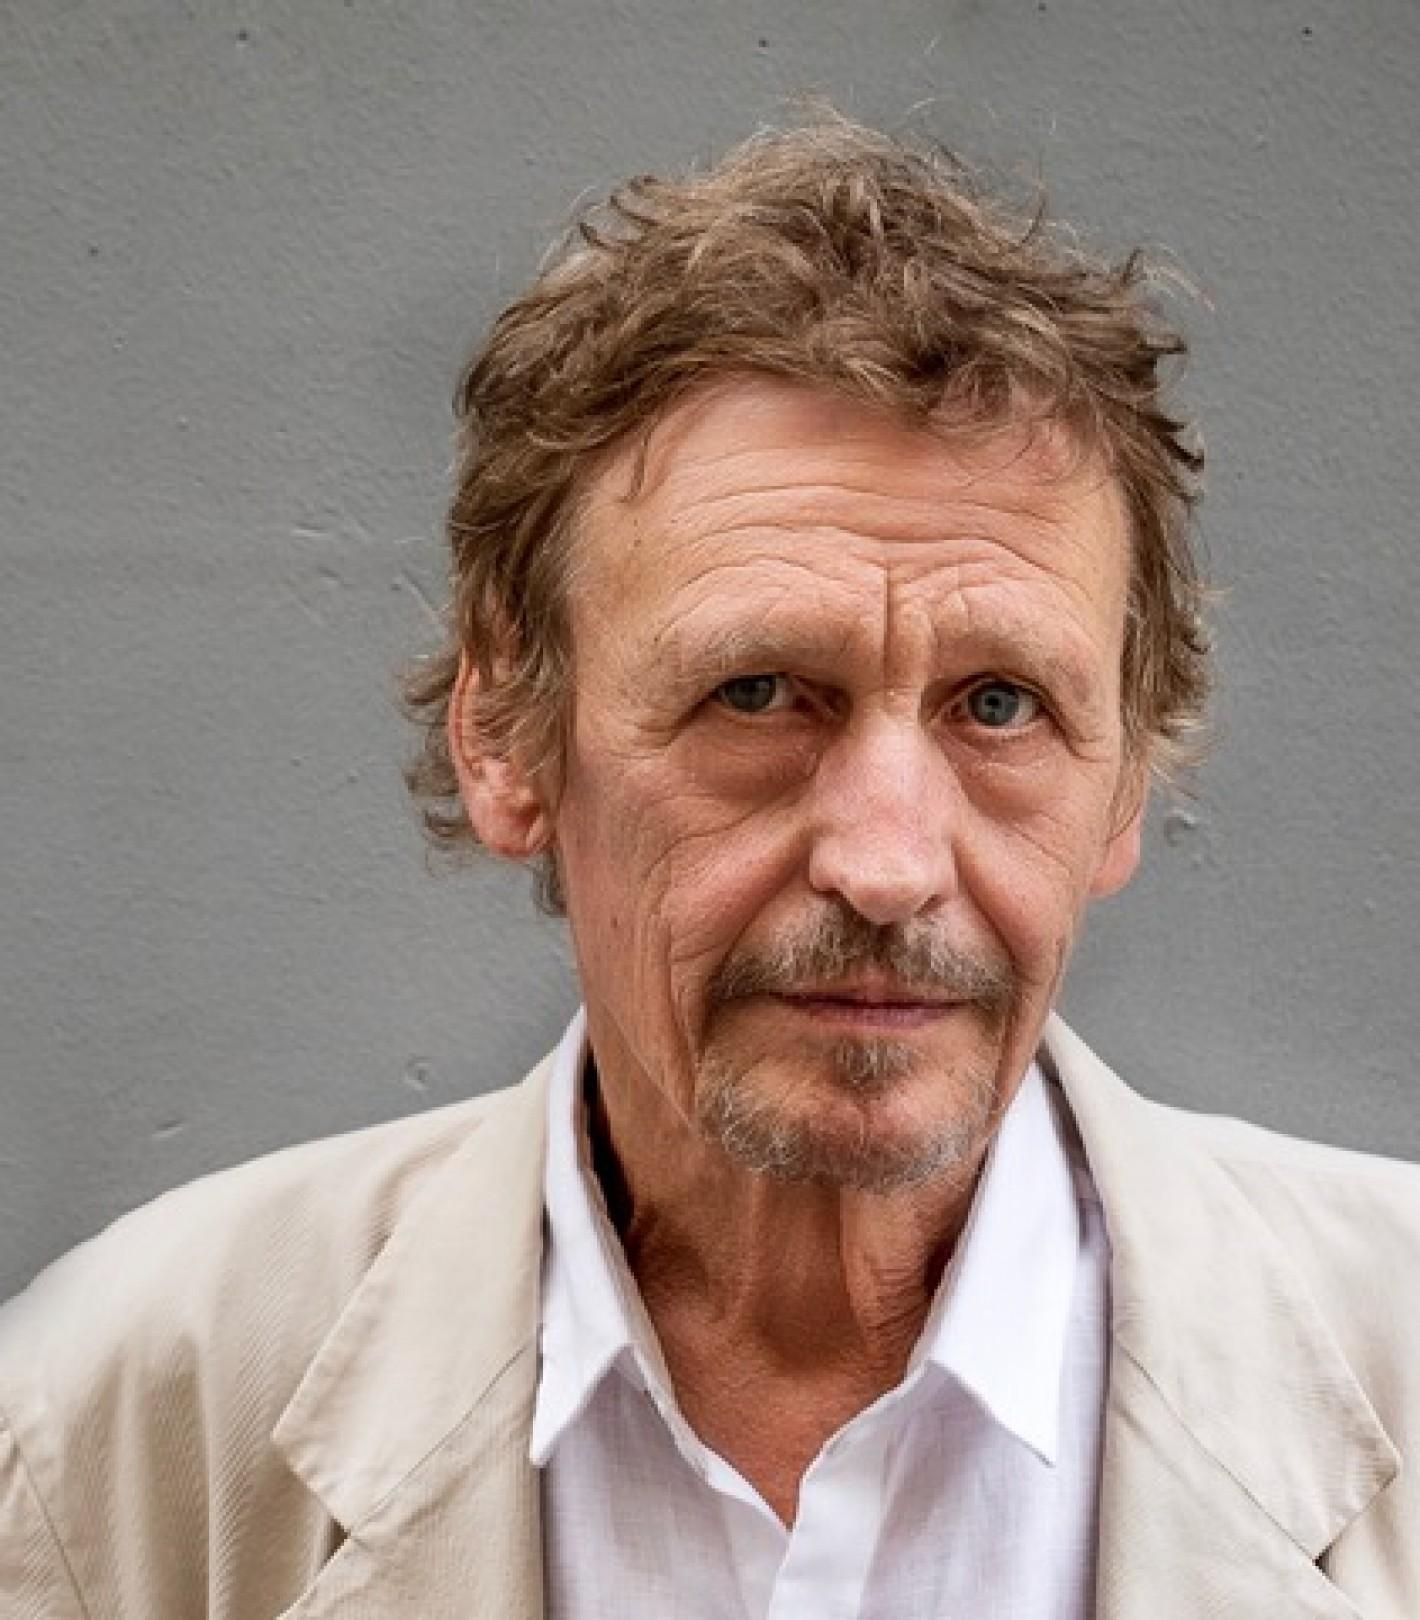 Didier Sauvegrain